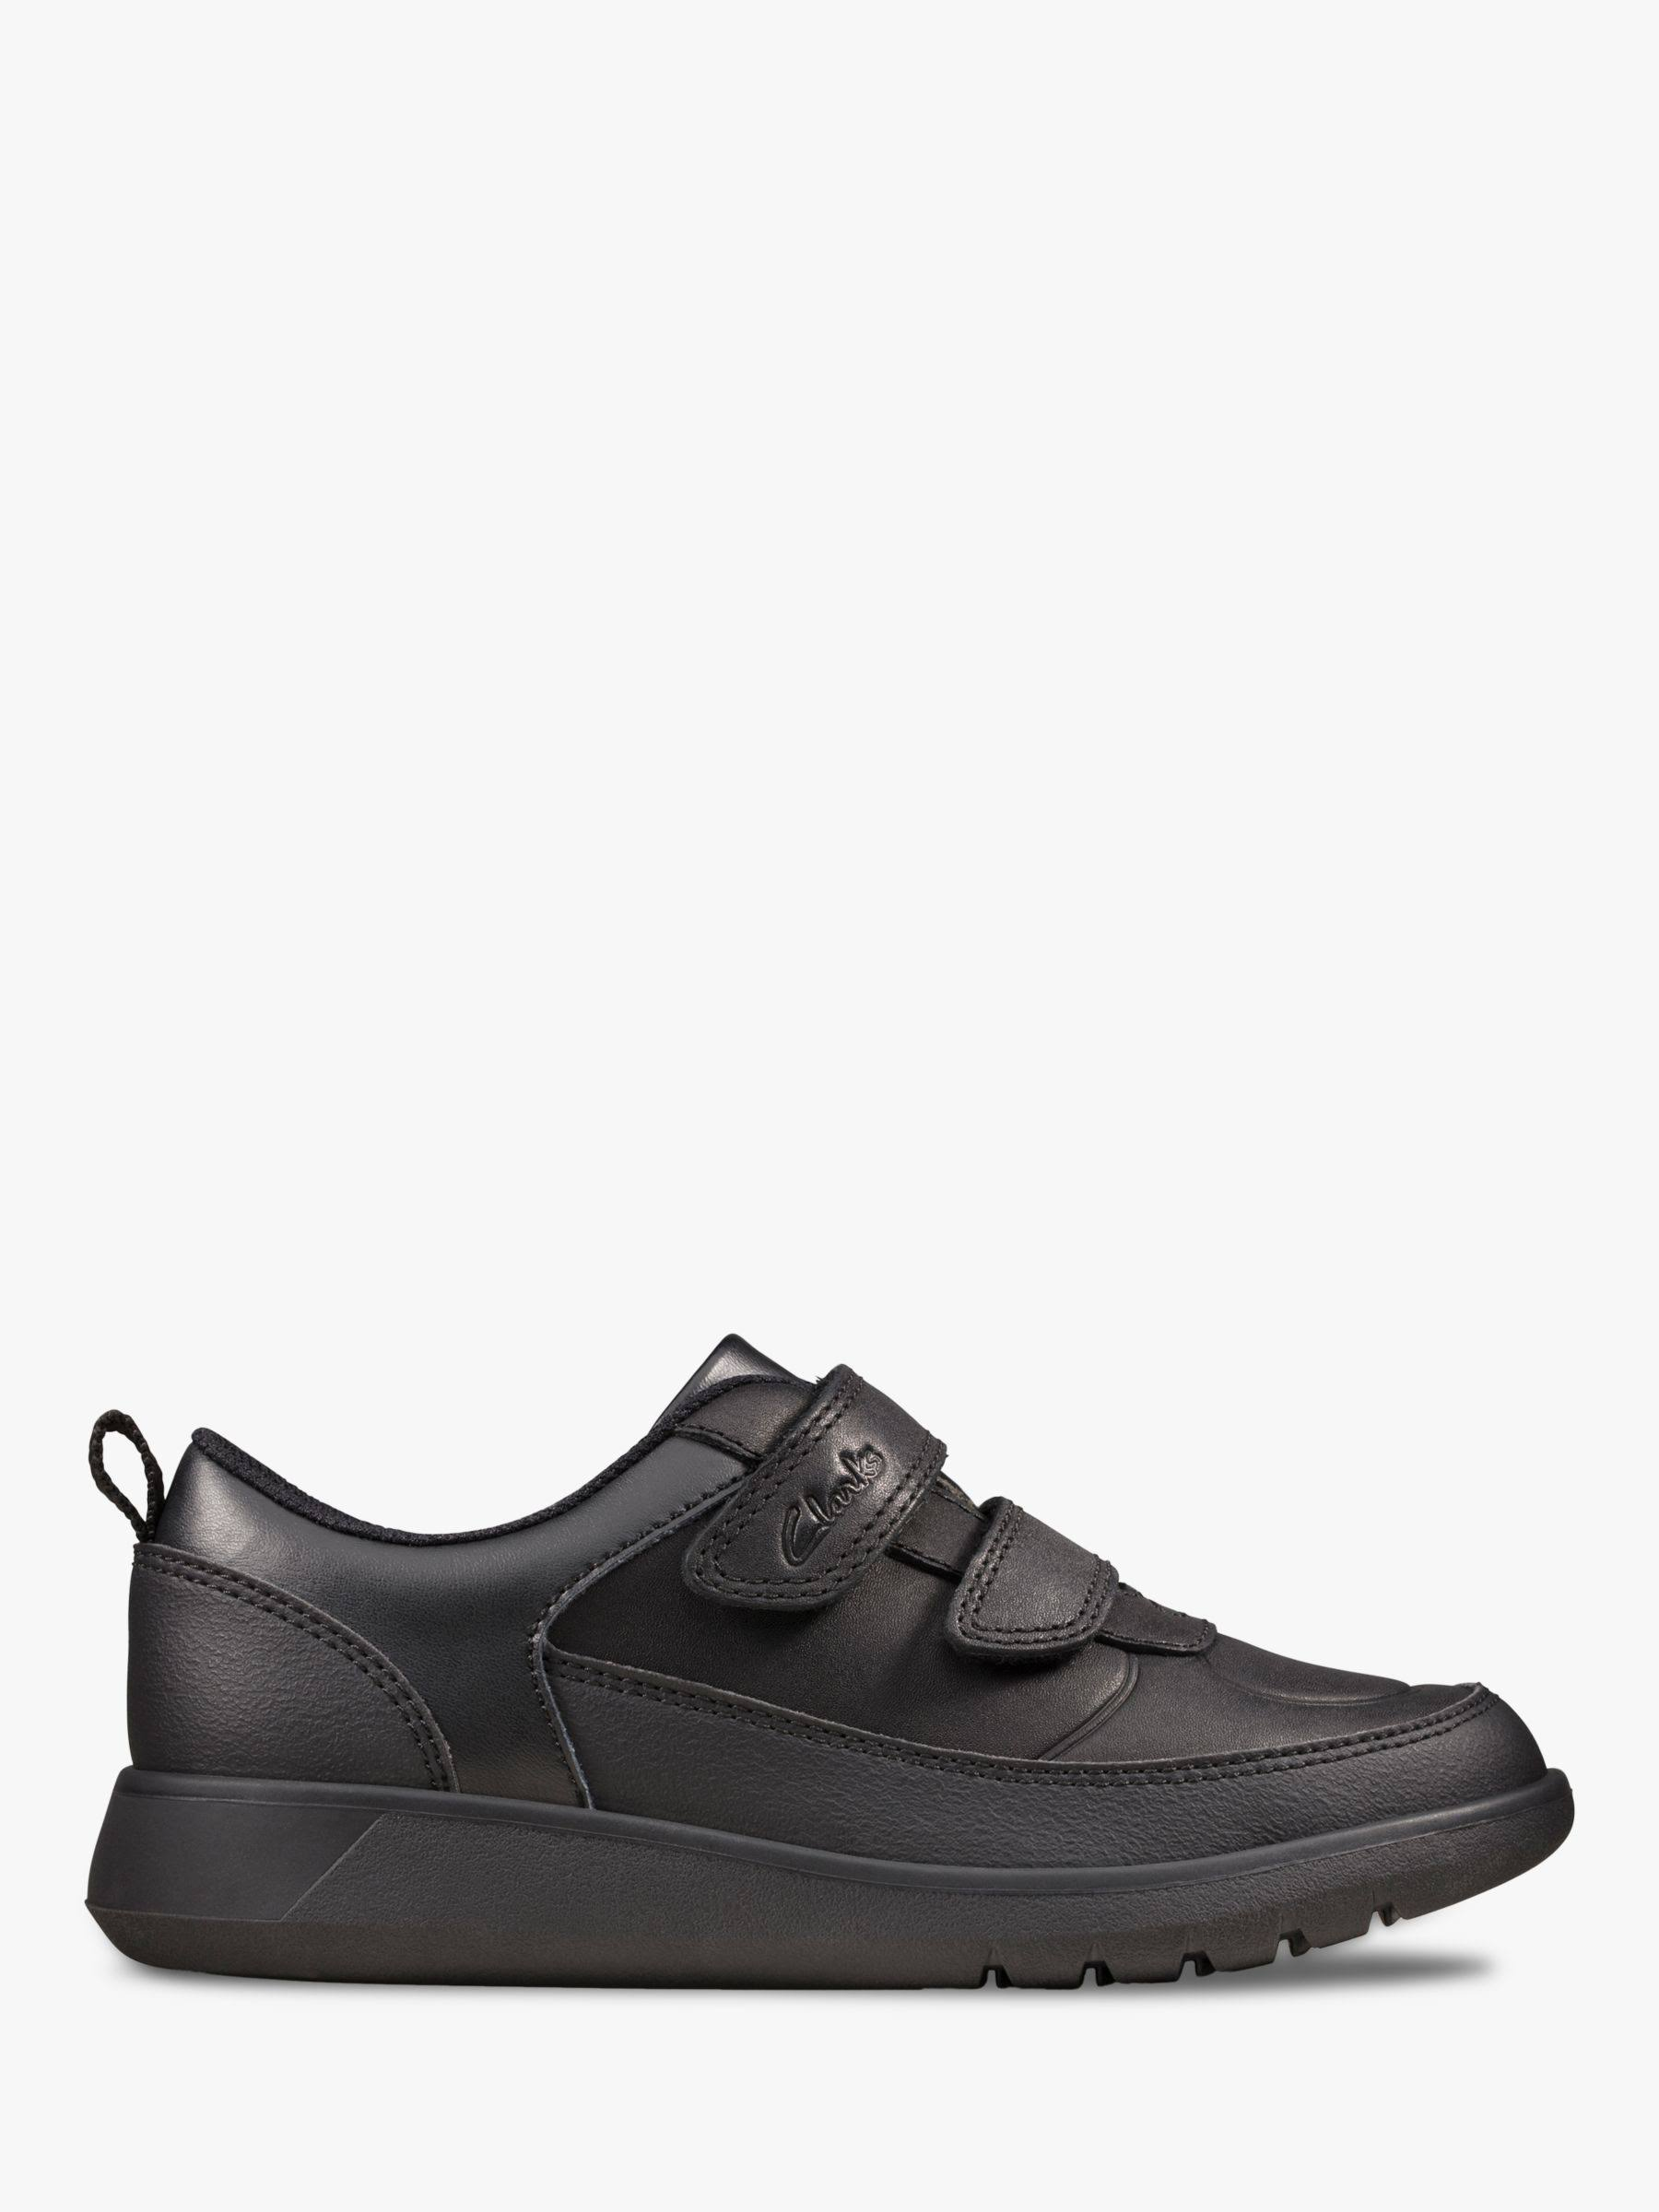 Clarks Kids School Shoes-Scape Flare Kid-Size: 1 F- Black